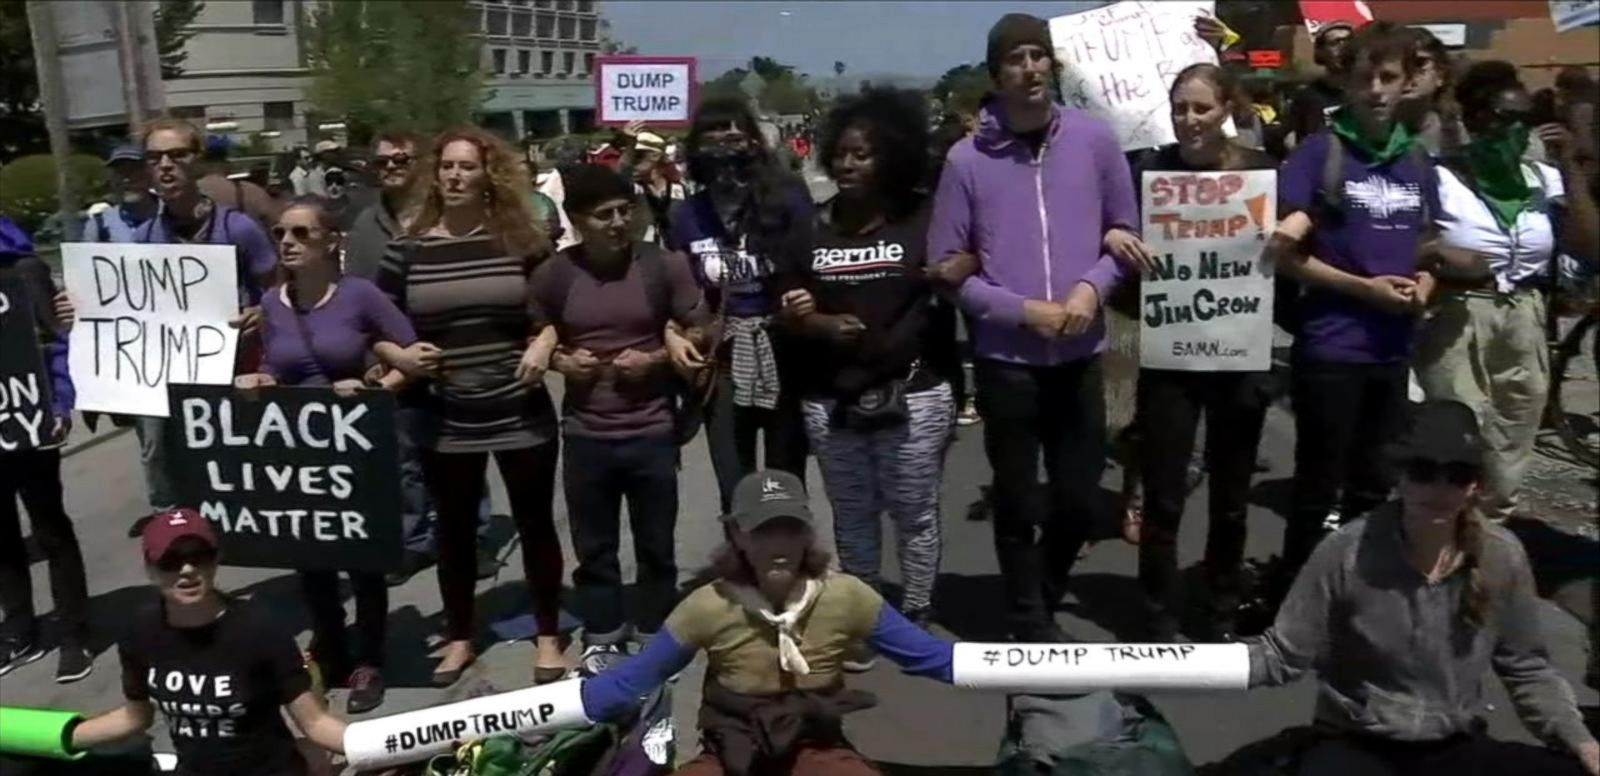 VIDEO: Donald Trump Enters Through Back Door to Avoid Waves of Protestors